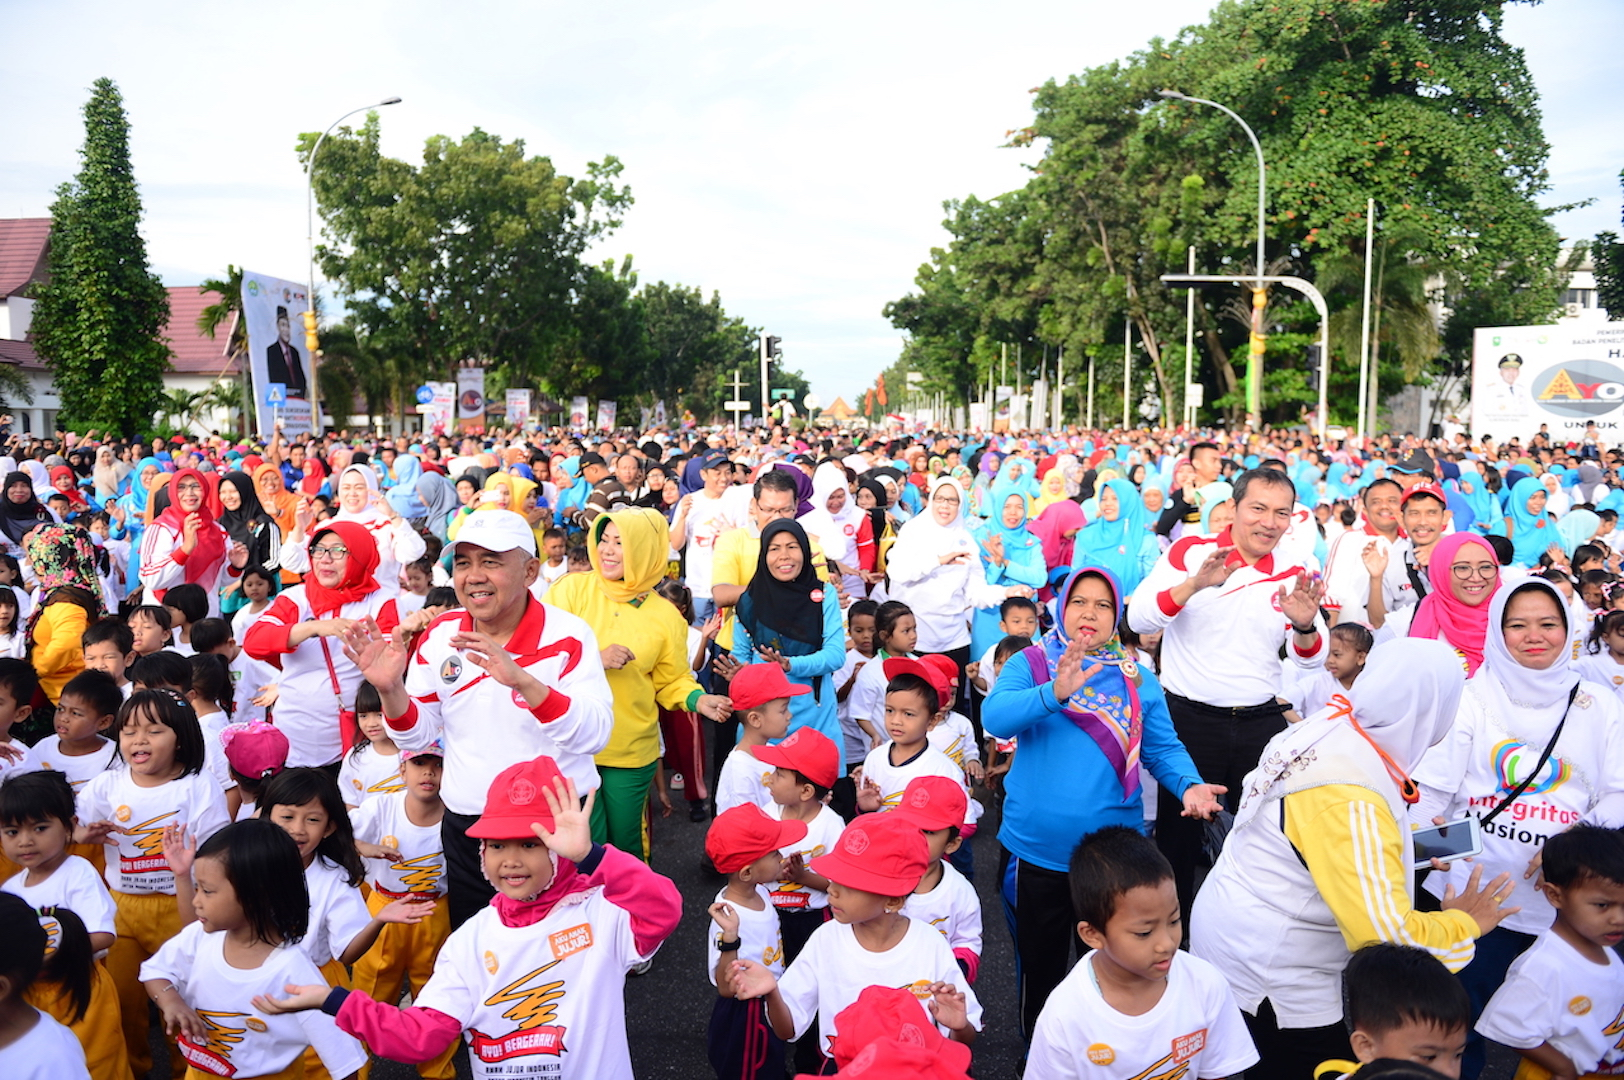 Gubri, Wakil Ketua KPK RI ikuti Senam Anak Jujur dalam Rangka Festival HAKI Bidang Pendidikan di CFD Jl Diponegoro